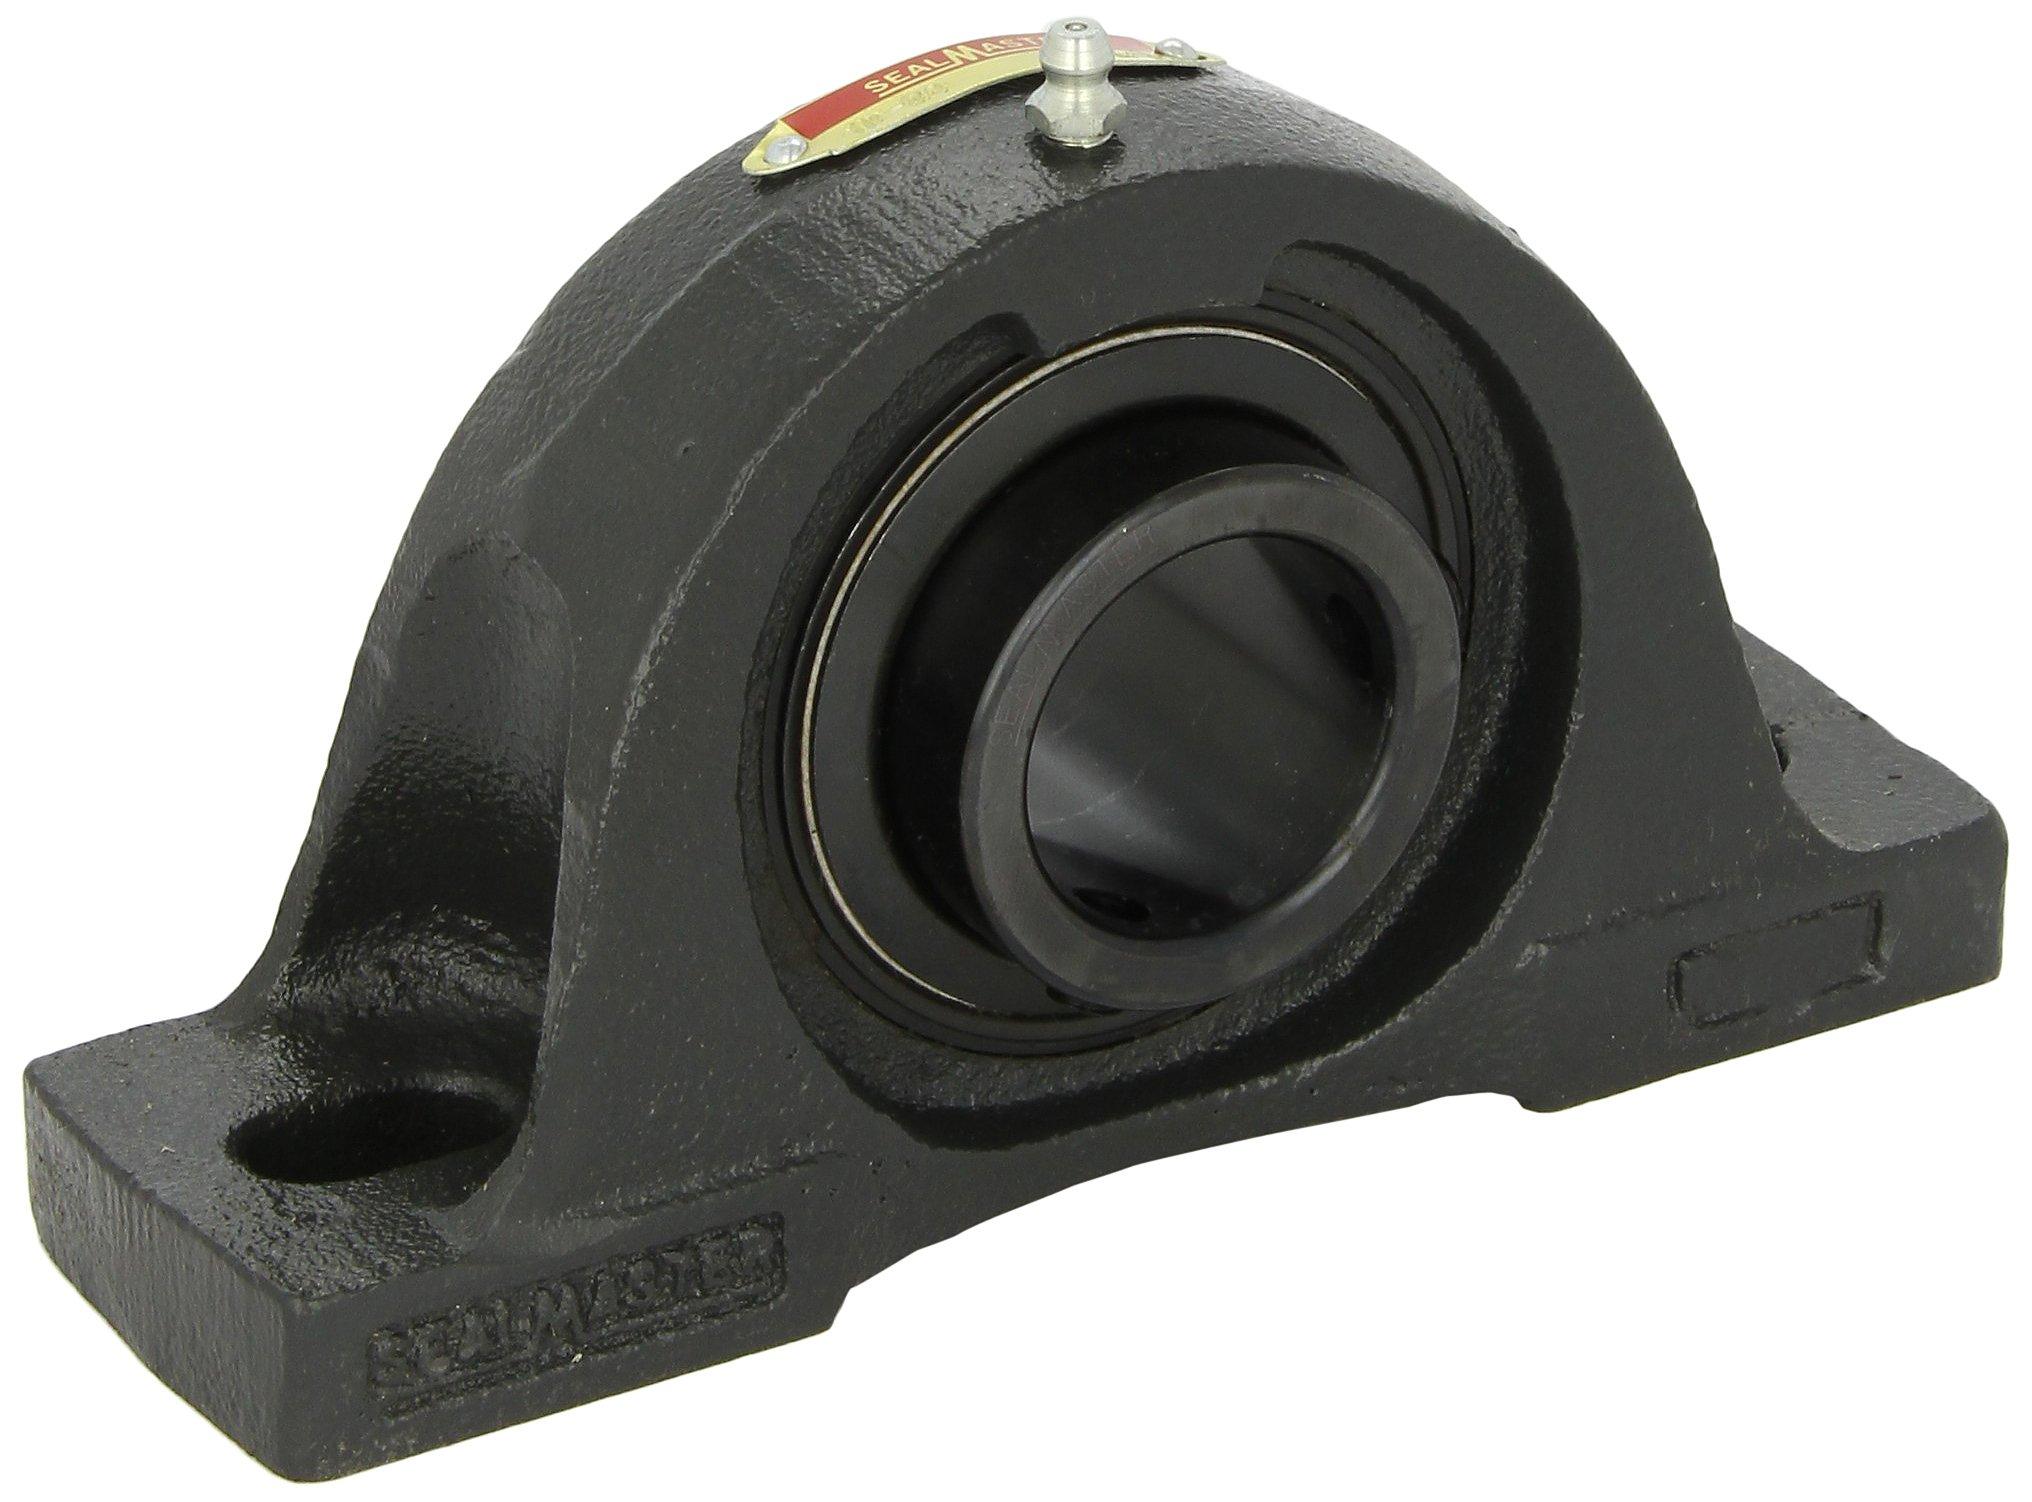 "Sealmaster NP-32R Pillow Block Ball Bearing, Non-Expansion Type, Normal-Duty, Regreasable, Setscrew Locking Collar, Felt Seals, Cast Iron Housing, 2"" Bore, 2-1/4"" Base to Center Height, 6-1/4"" Bolt Hole Spacing Width"